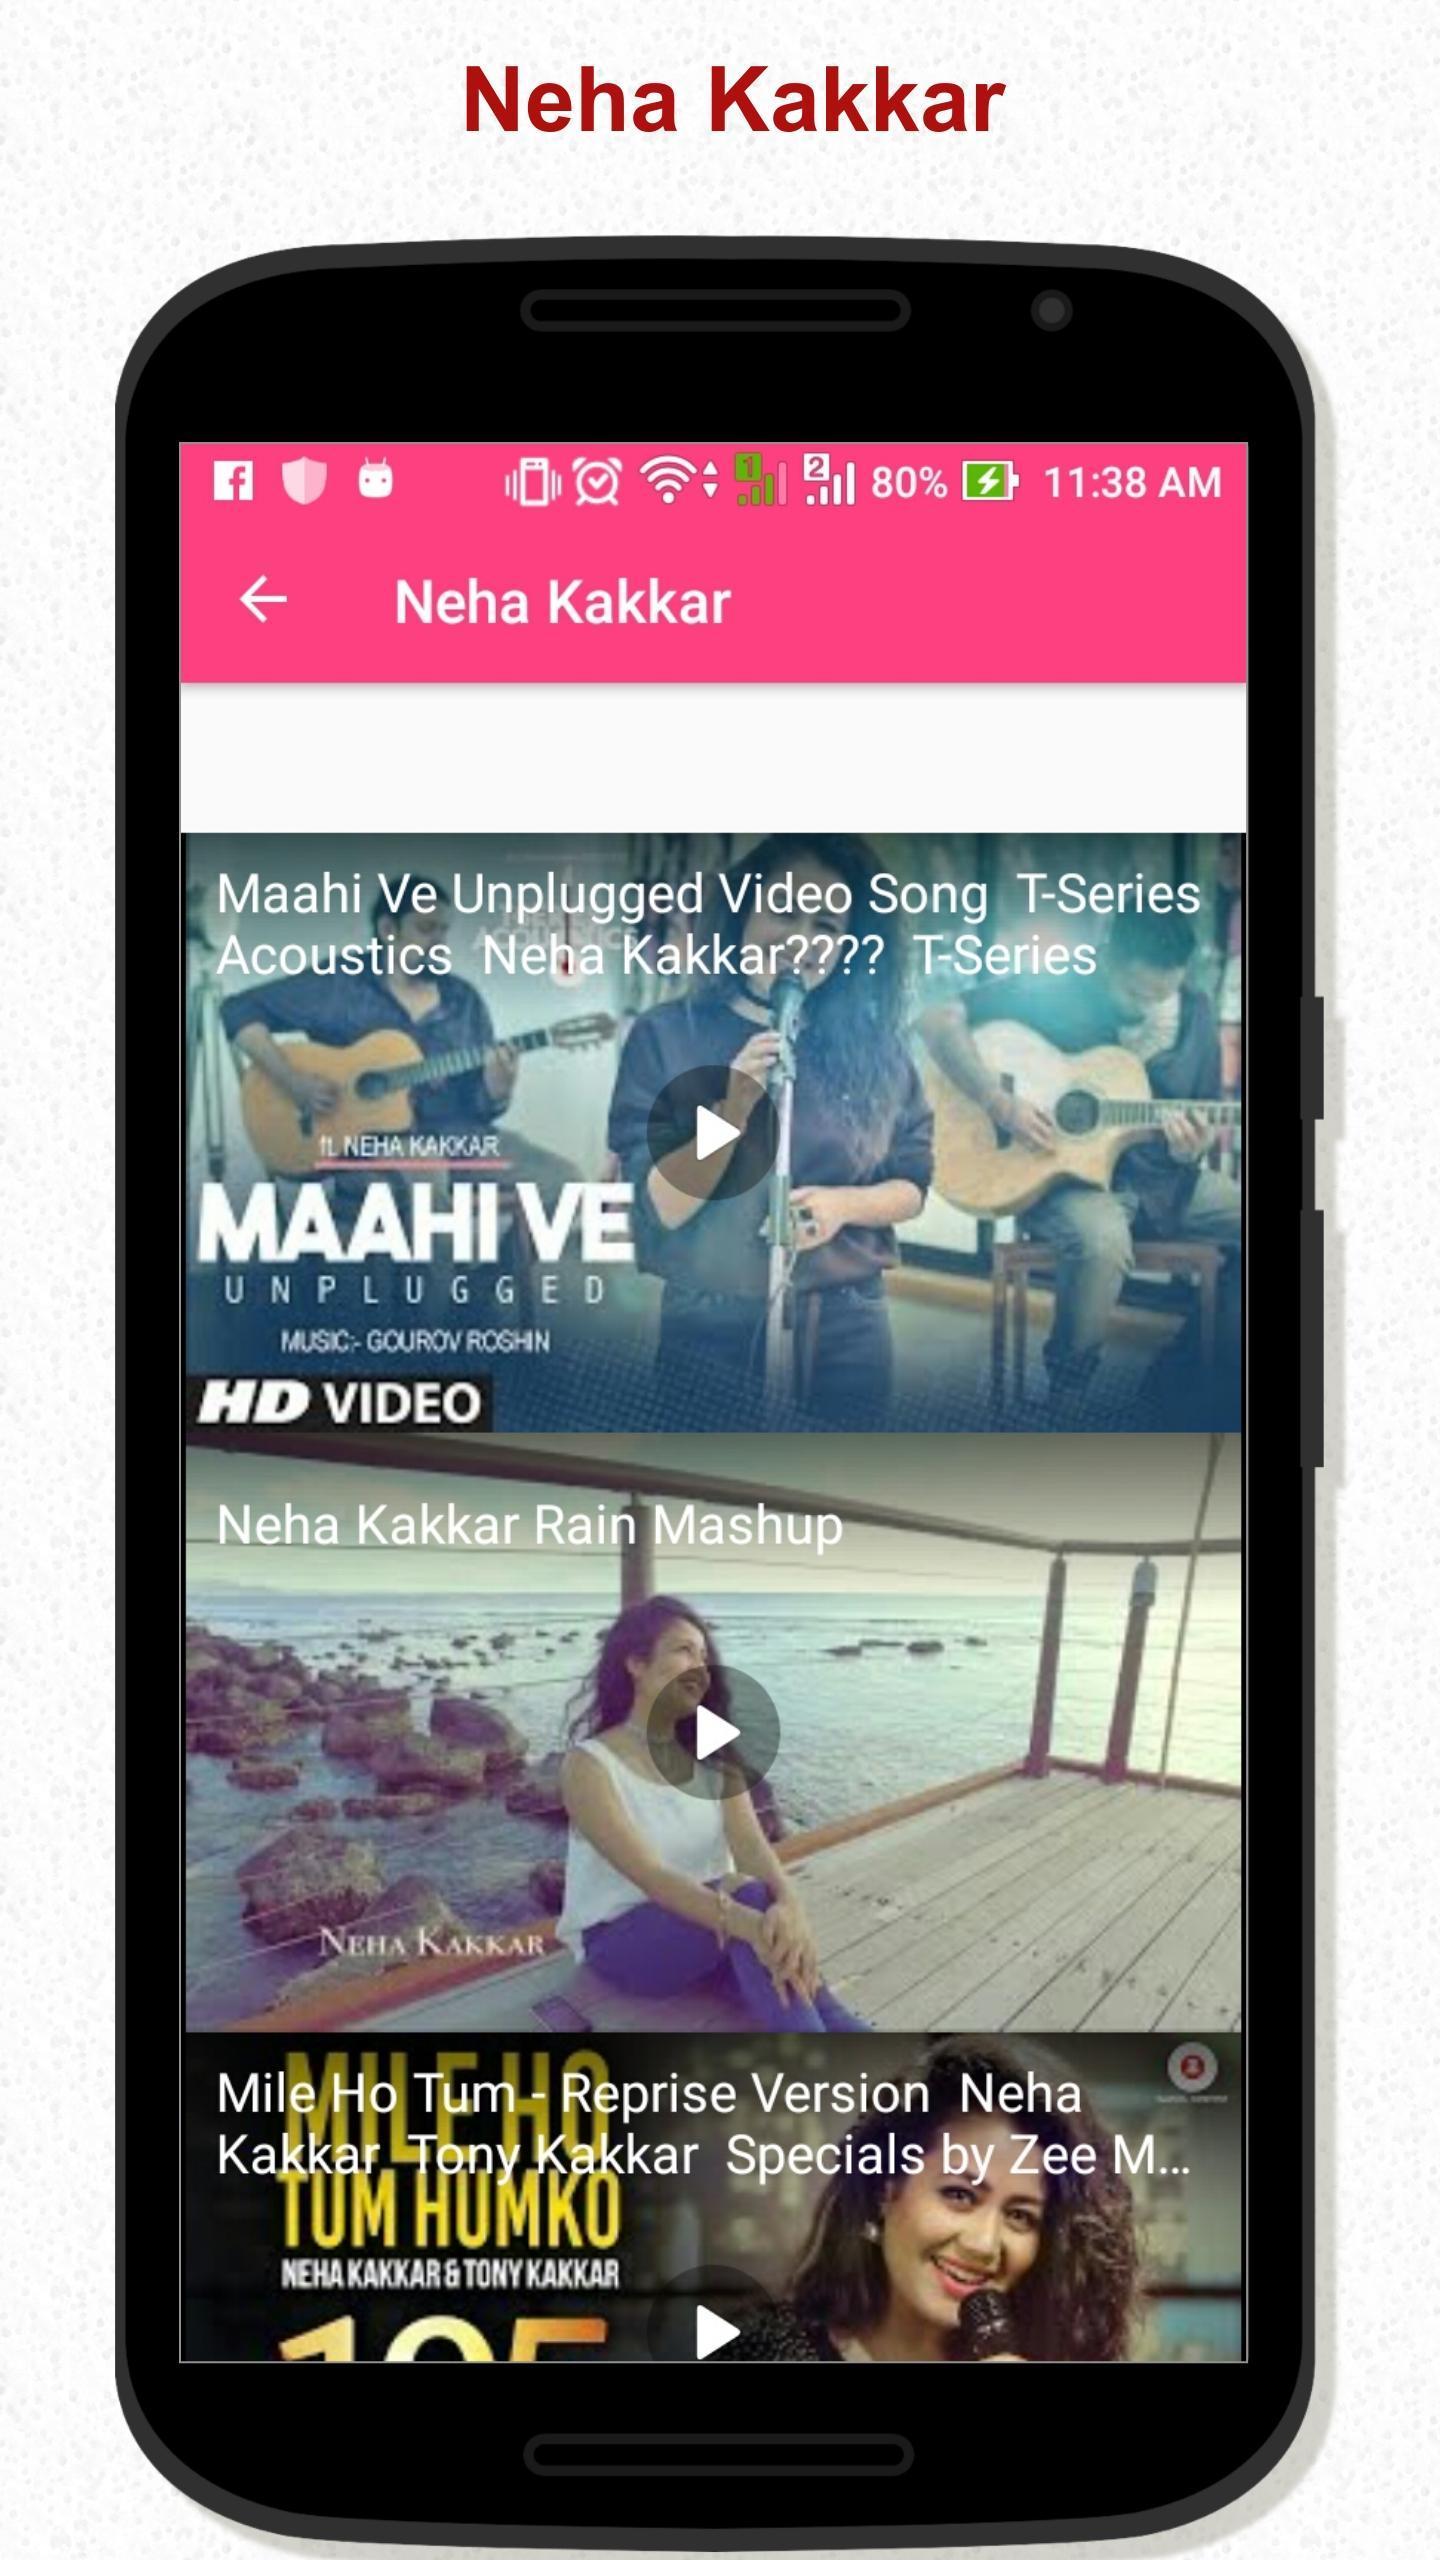 Neha Kakkar video song for Android - APK Download